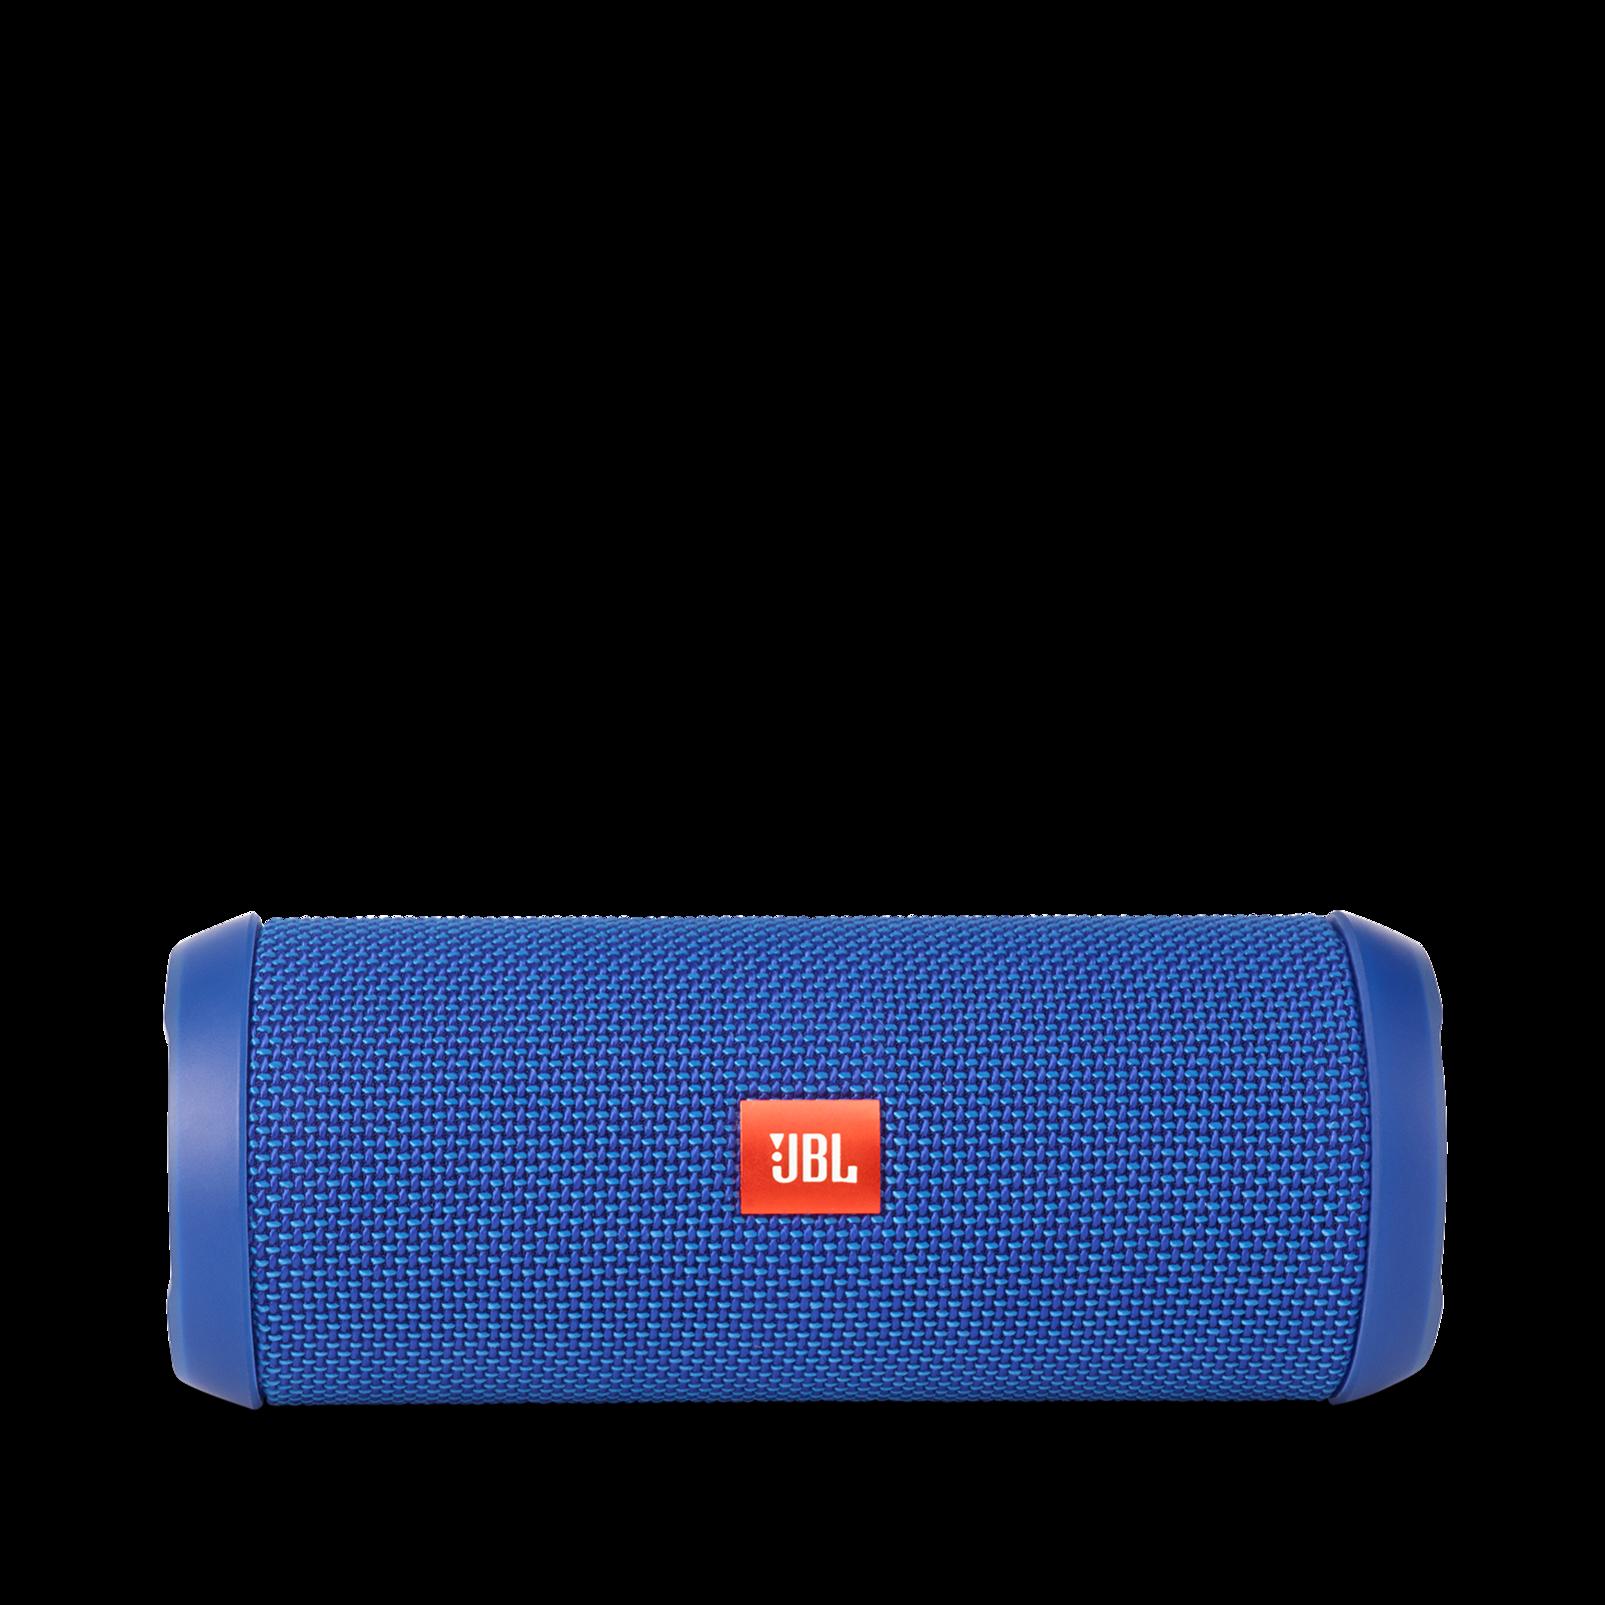 JBL Flip 3 - Blue - Splashproof portable Bluetooth speaker with powerful sound and speakerphone technology - Front